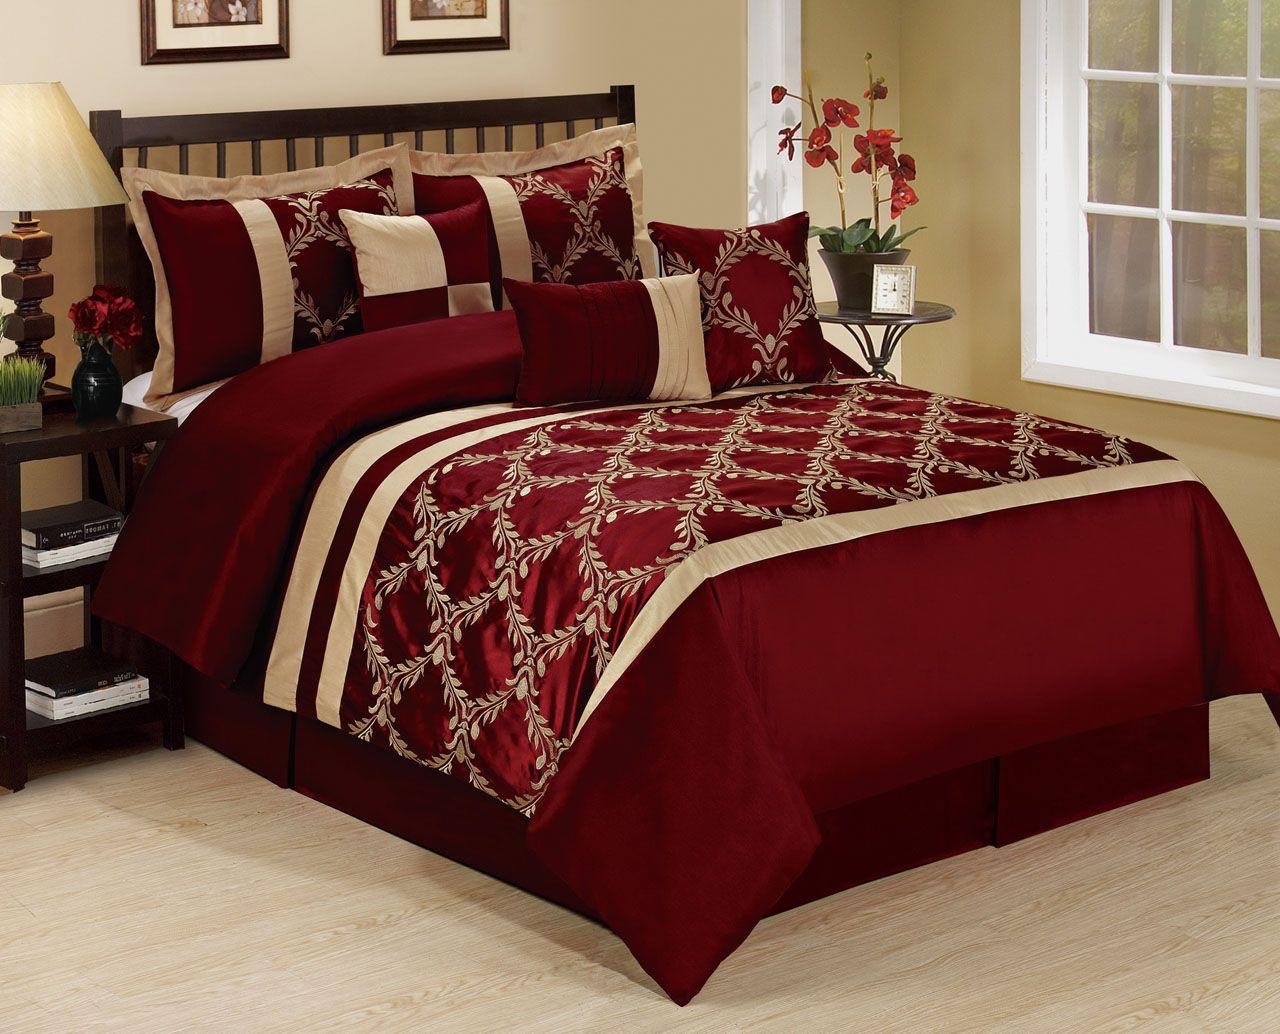 Luxury 7 Piece Comforter Set Elegant Embroidered Bedding Burgundy/Gold New.